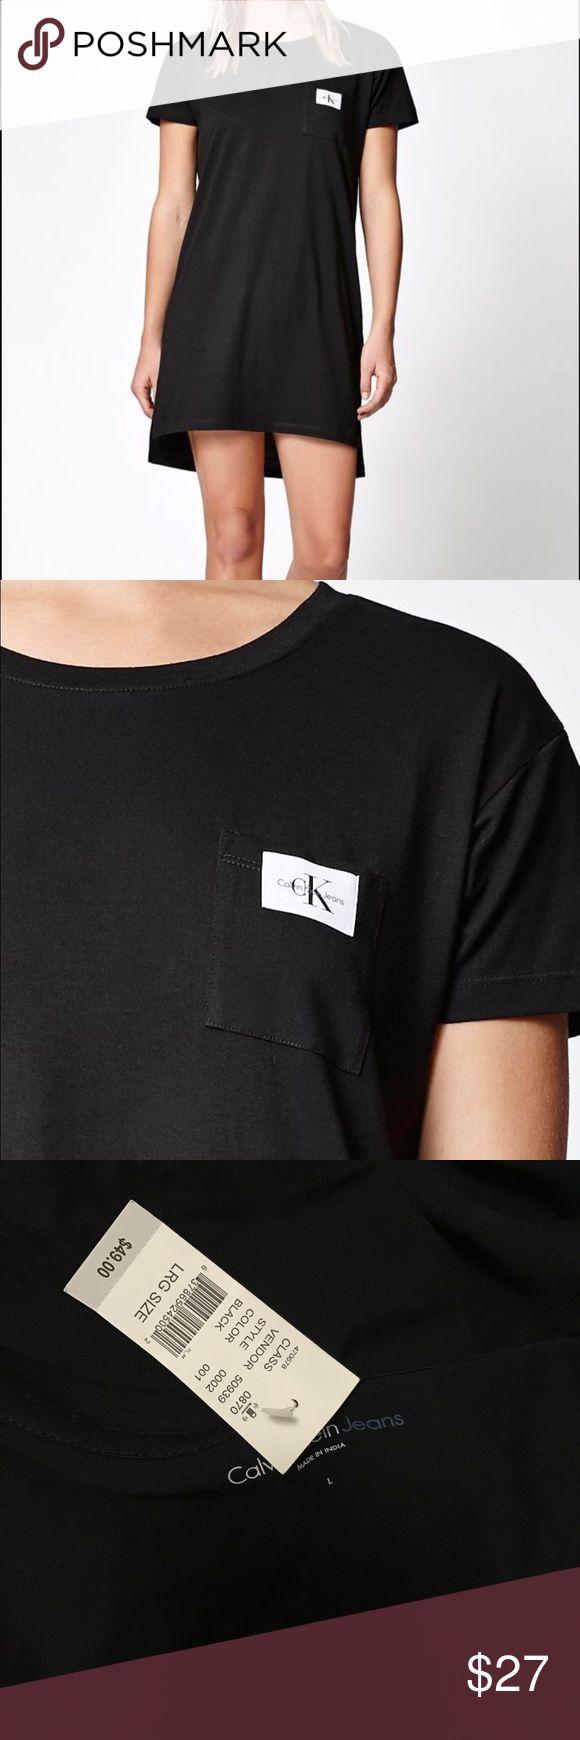 Calvin Klein Woven Label T Shirt Dress Calvin Klein T-Shirt Dress. Very comfortable, soft fabric material Calvin Klein Dresses Mini